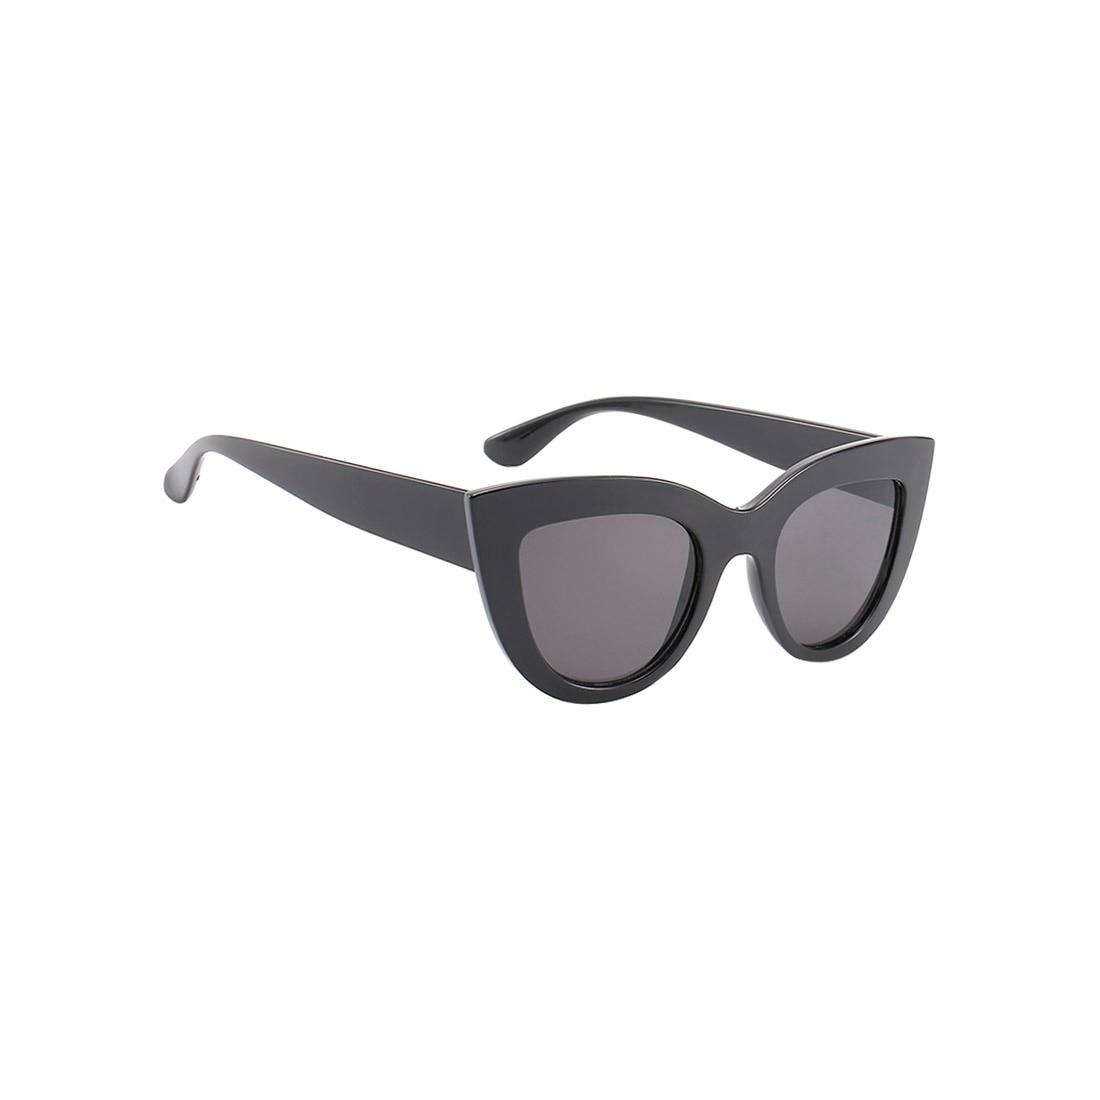 oculos Vintage Sunglasses Women Cat eye Sunglass Retro Sun glasses Female Pink Mirror Eyewear gafas de sol hombre in Women 39 s Sunglasses from Apparel Accessories